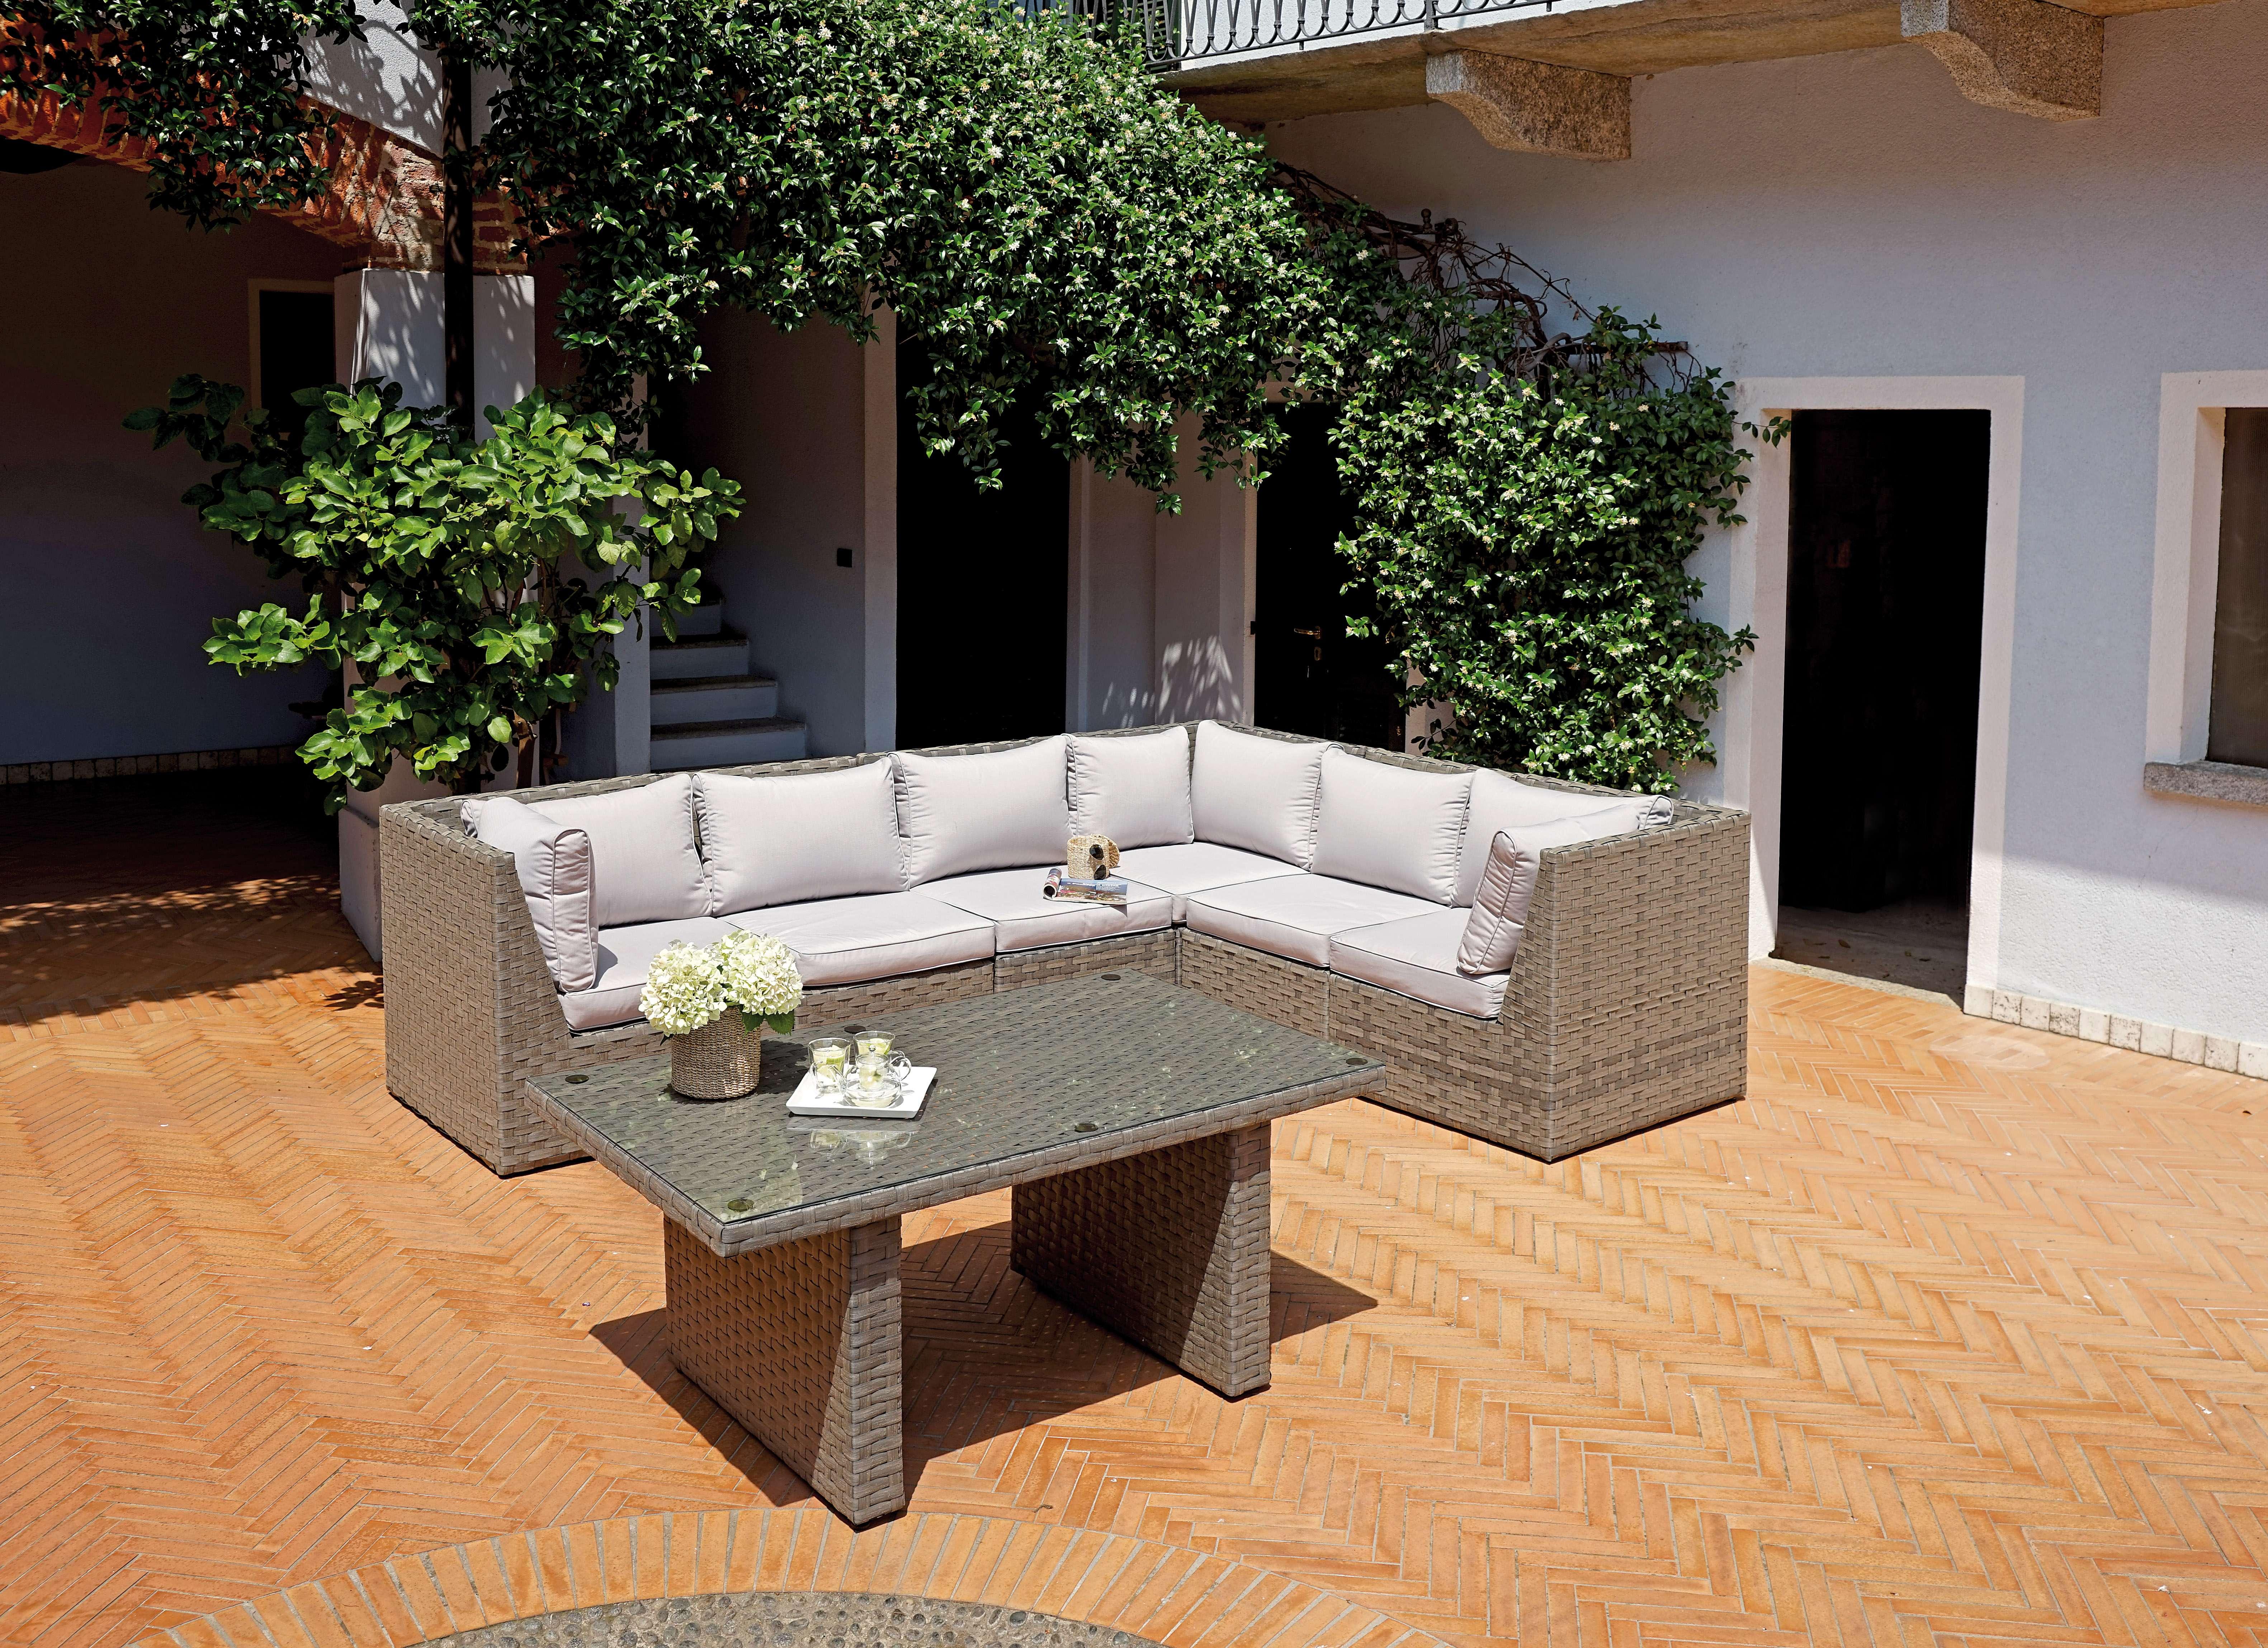 Ambientazione set59 greenwood mobili da giardino - Mobili da giardino in teak ...